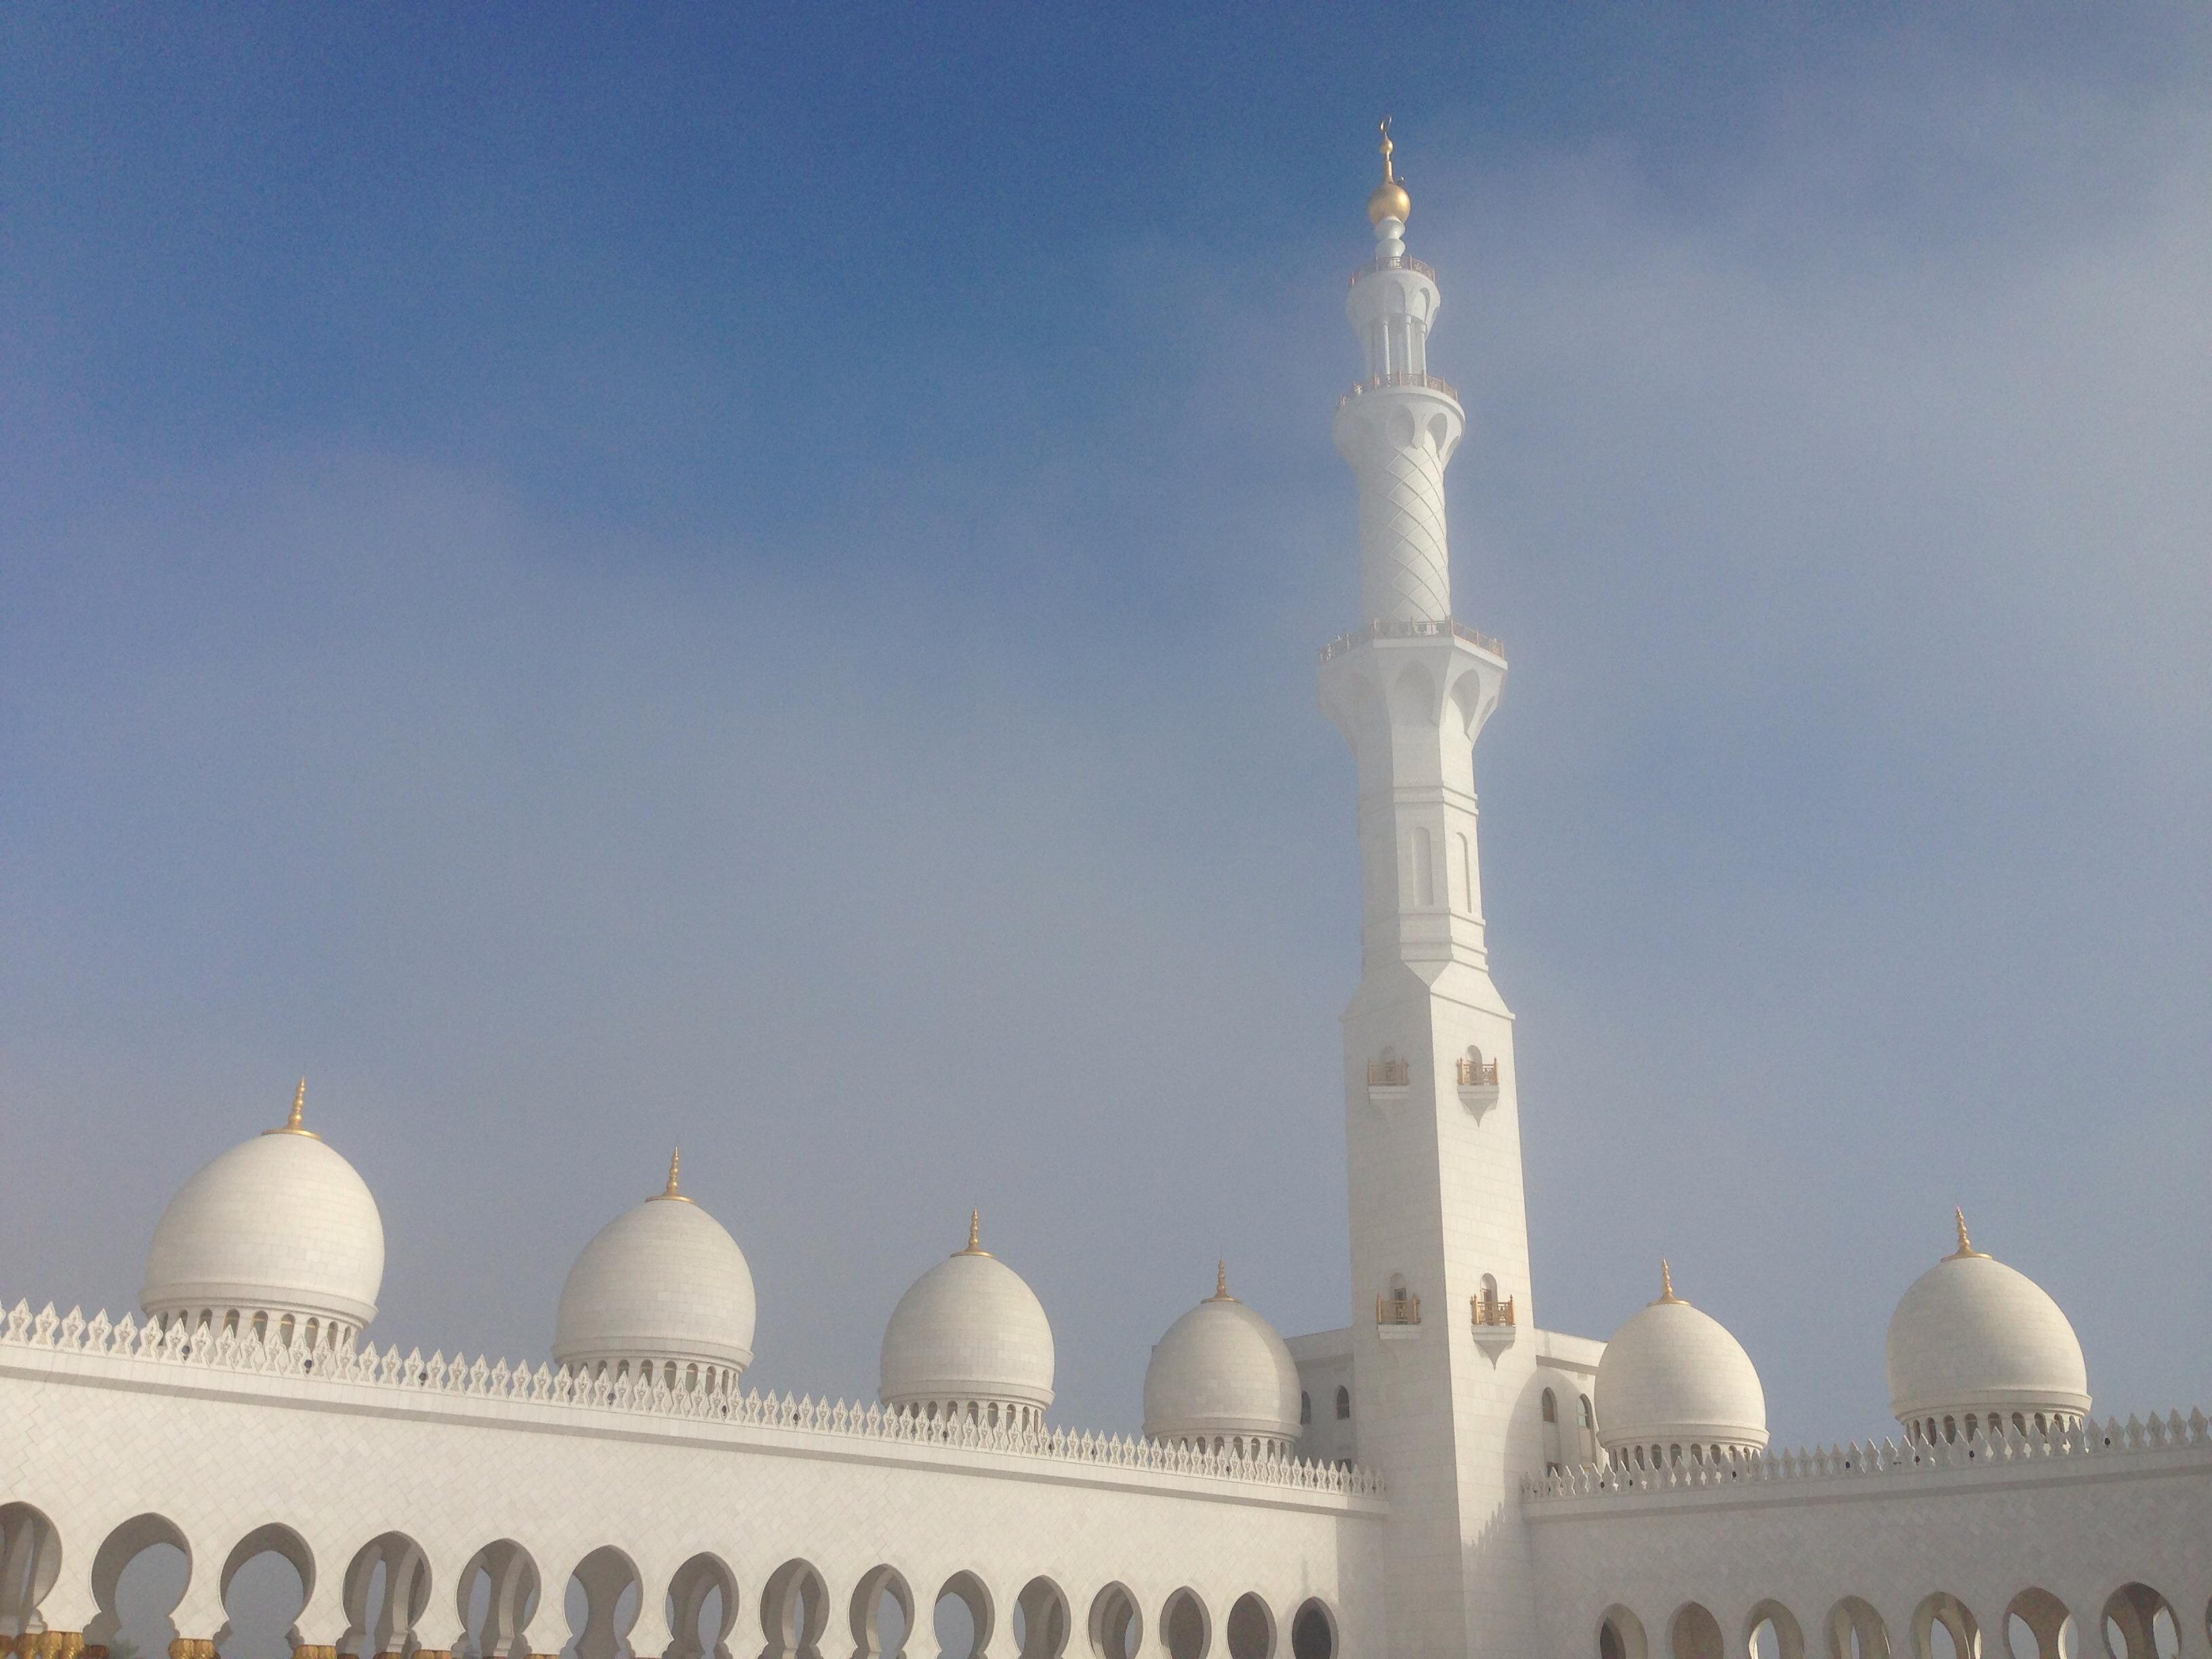 edificio viajar torre fiesta religin pareja lugar de adoracin mezquita islam arbica abu alminar minaretes